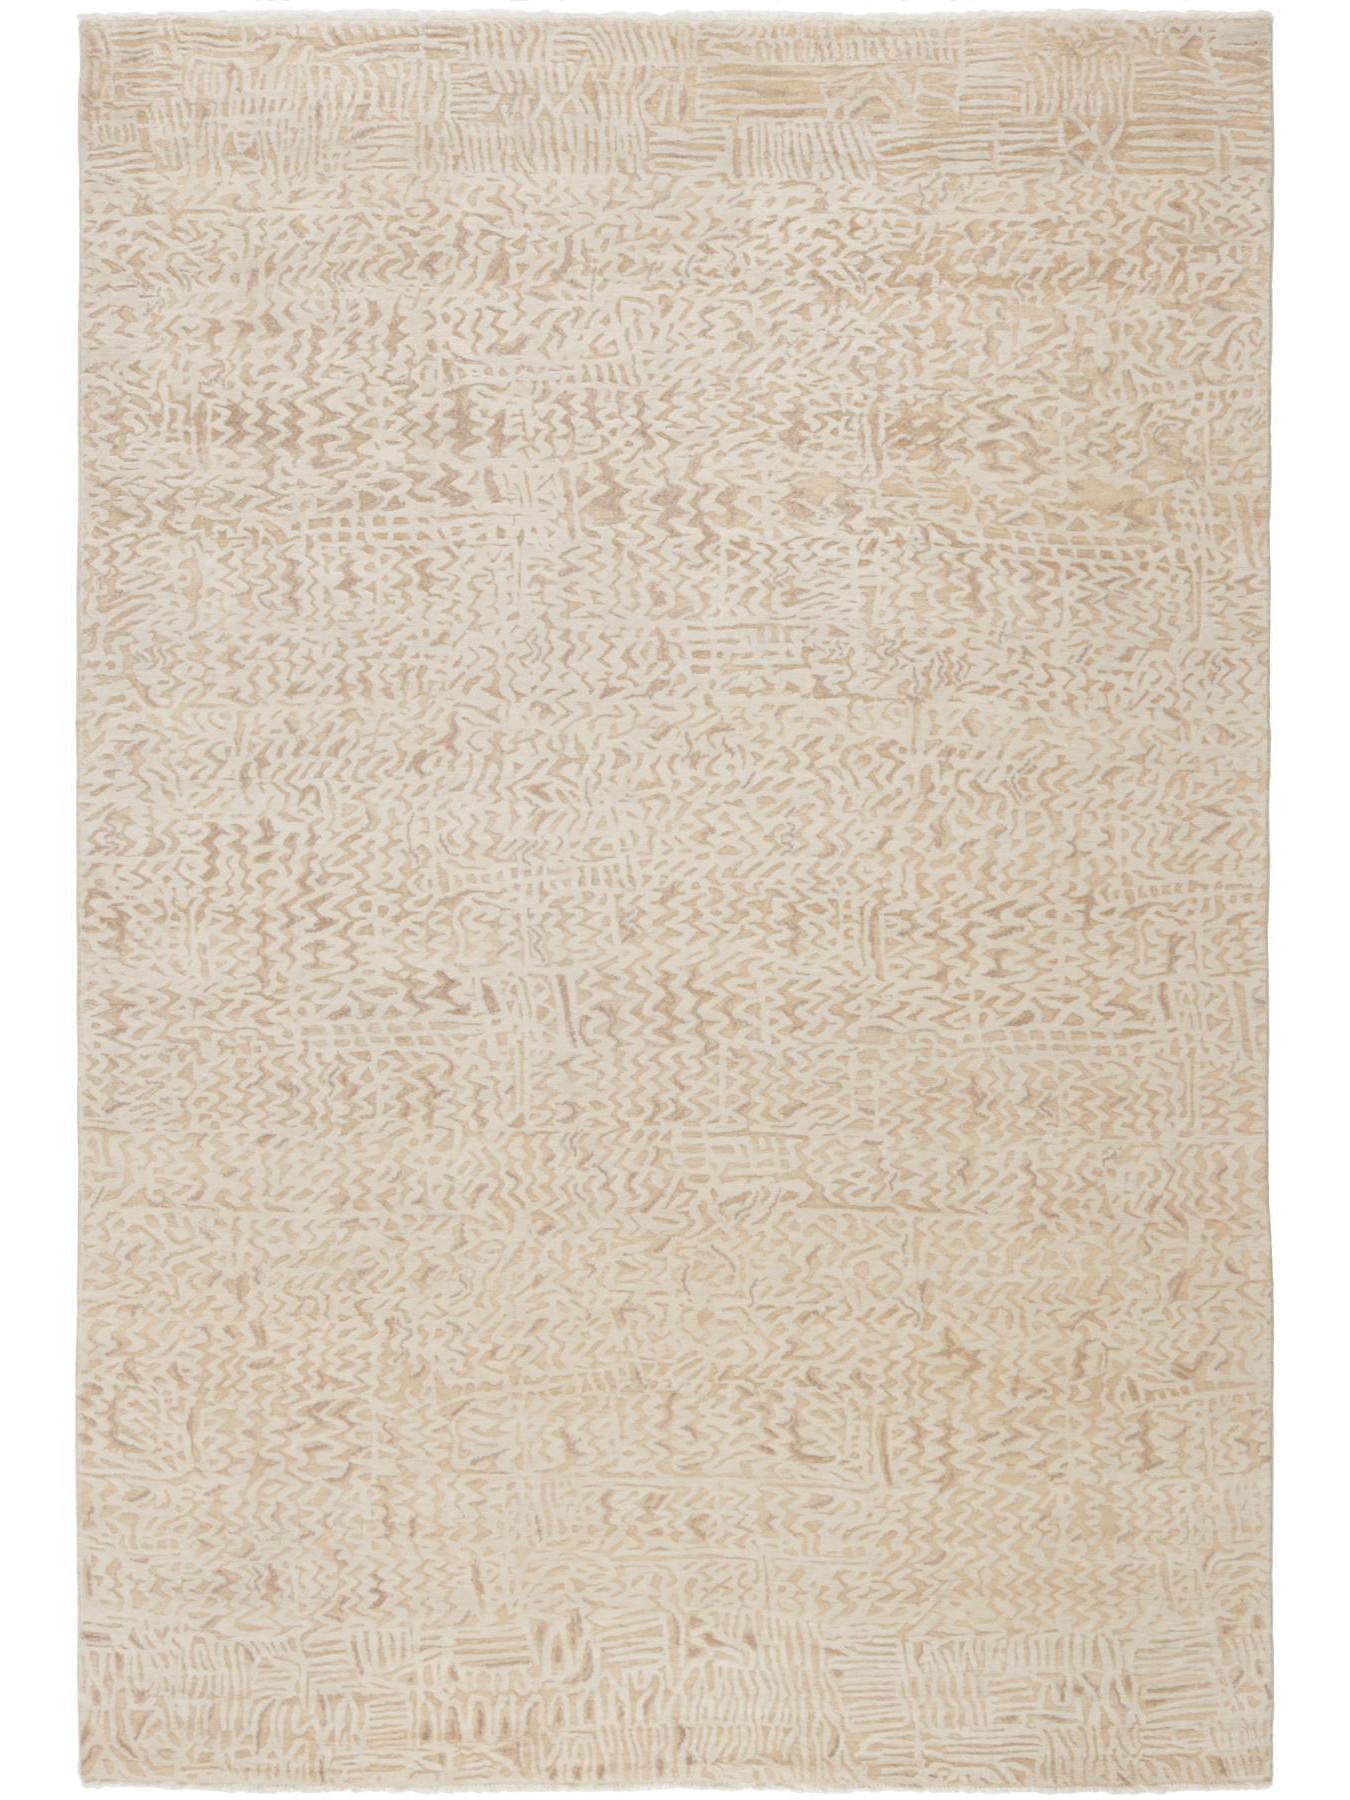 Luxury carpets - Damask-AL-450 B-75/D-022/B-65